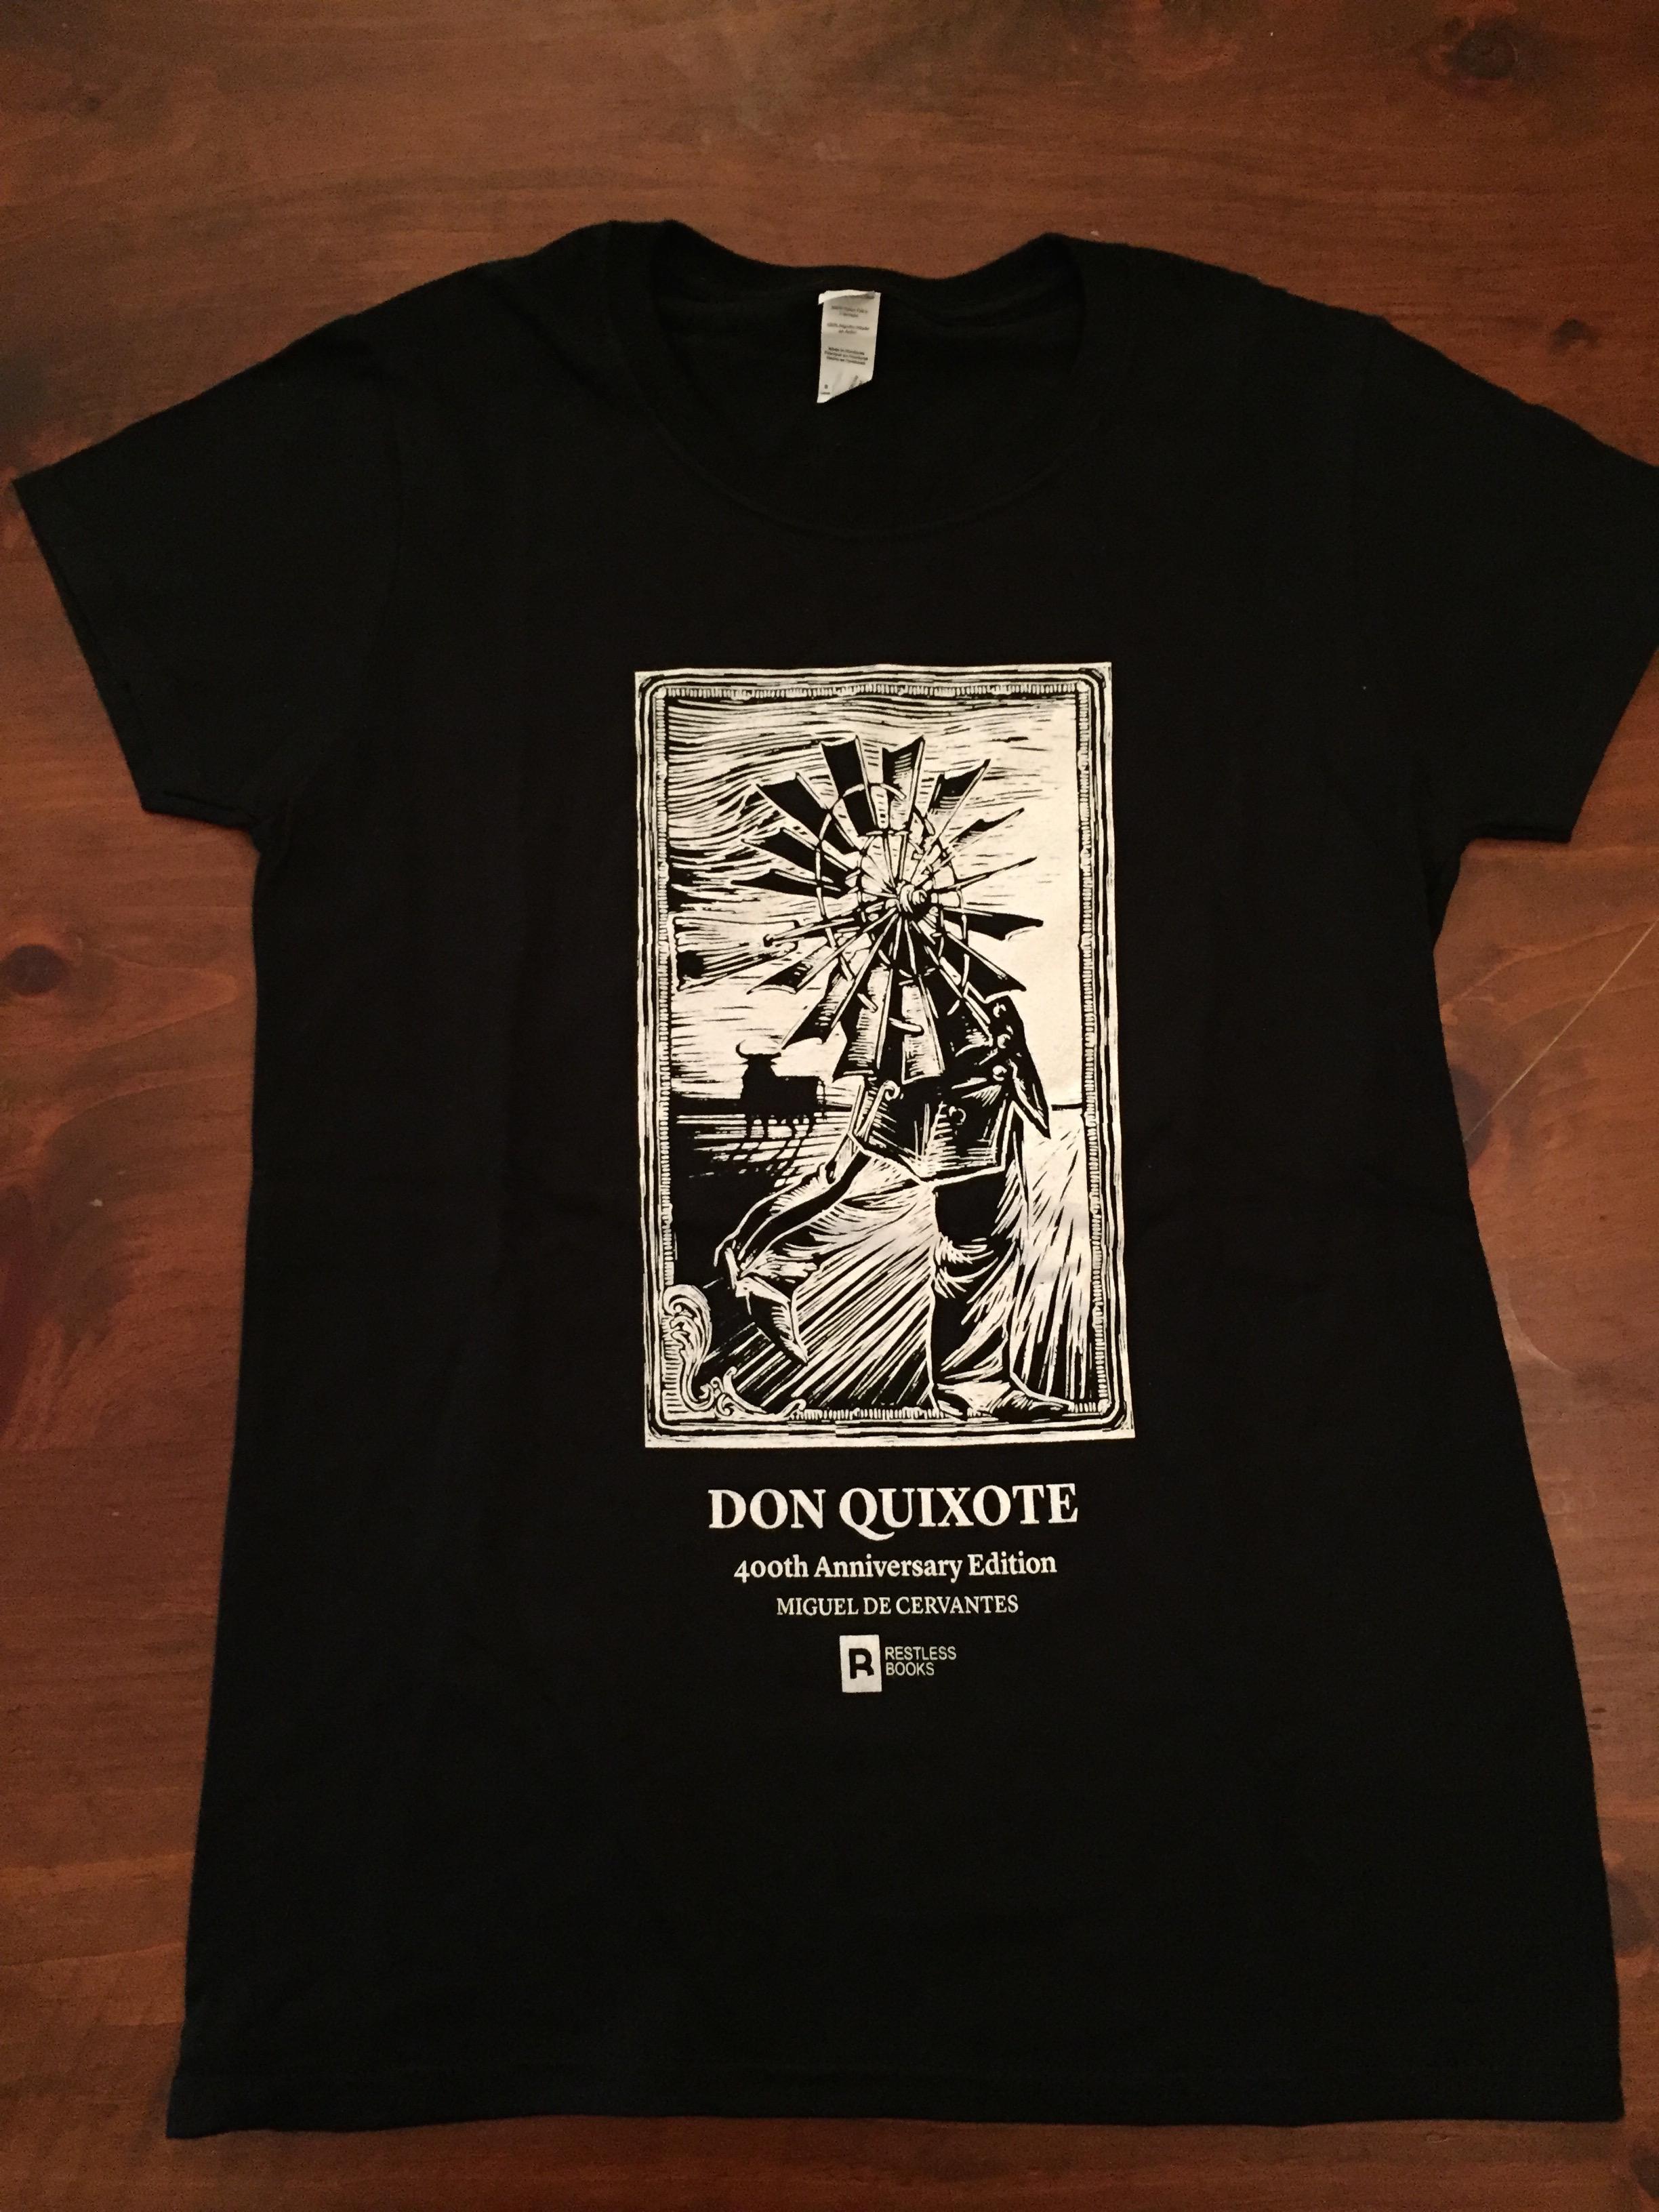 Don Quixote T-shirt - Windmill Giant.JPG